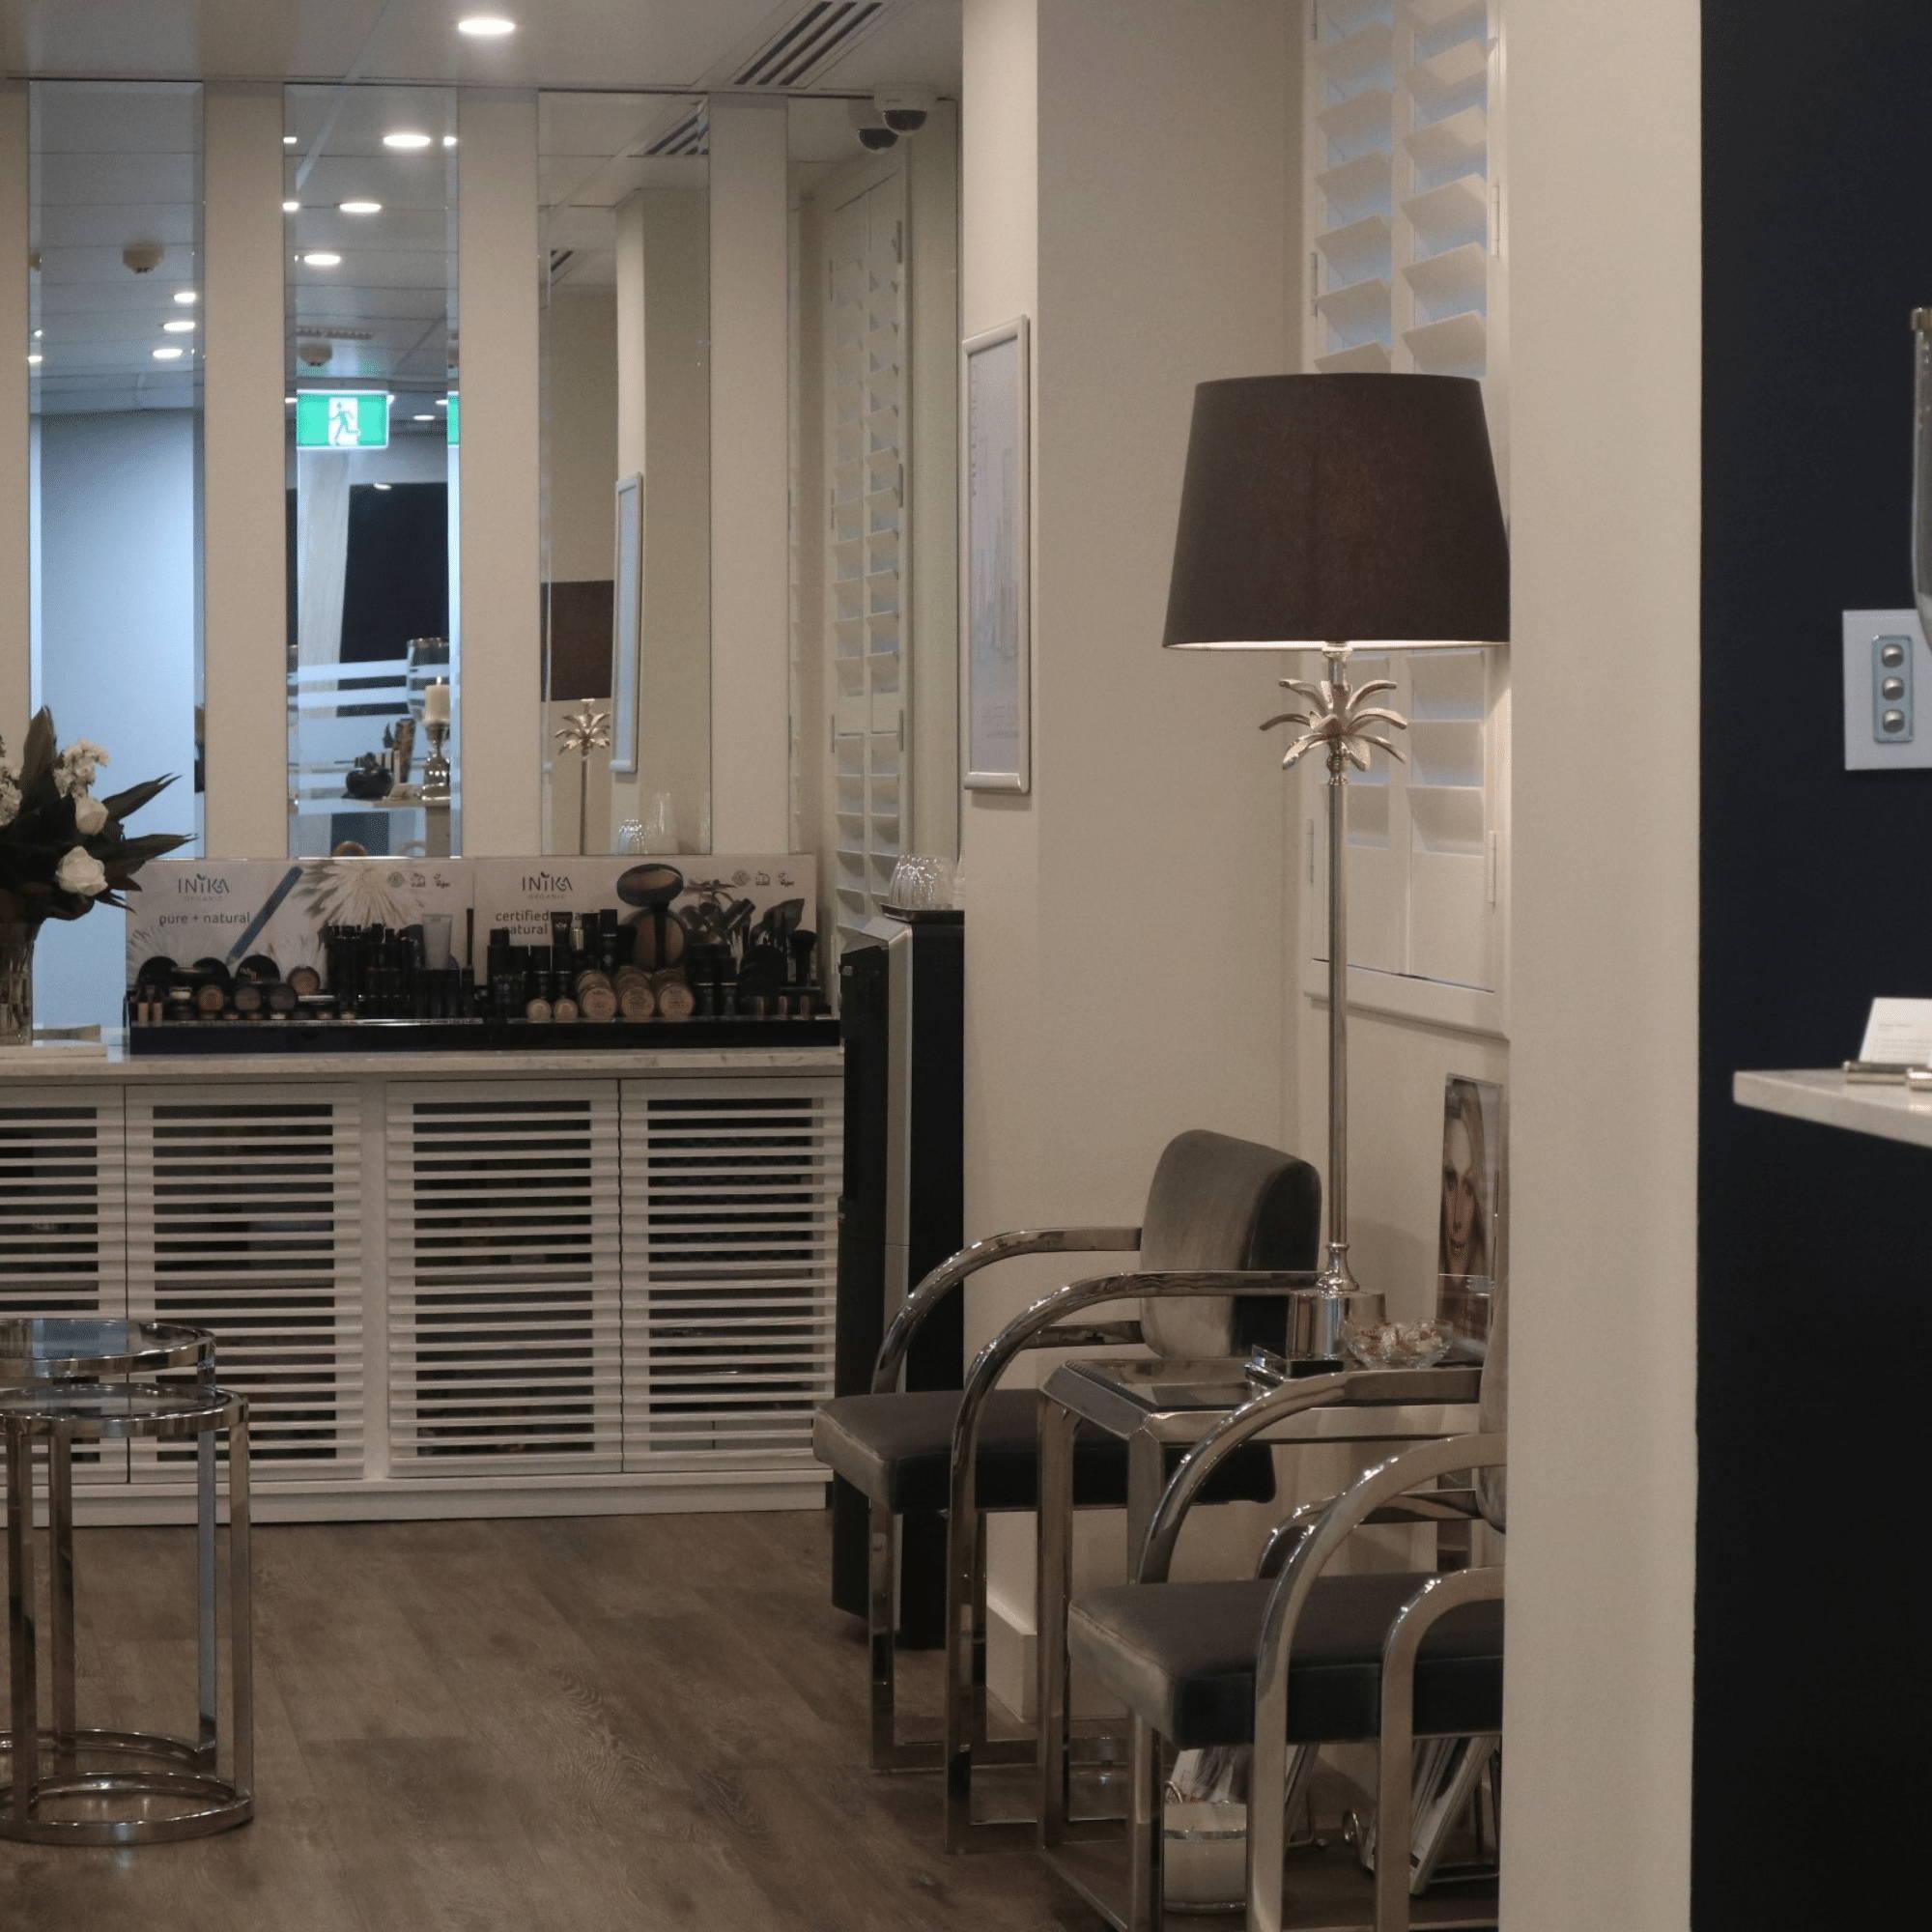 Reception Desk at The Skin Philosophy